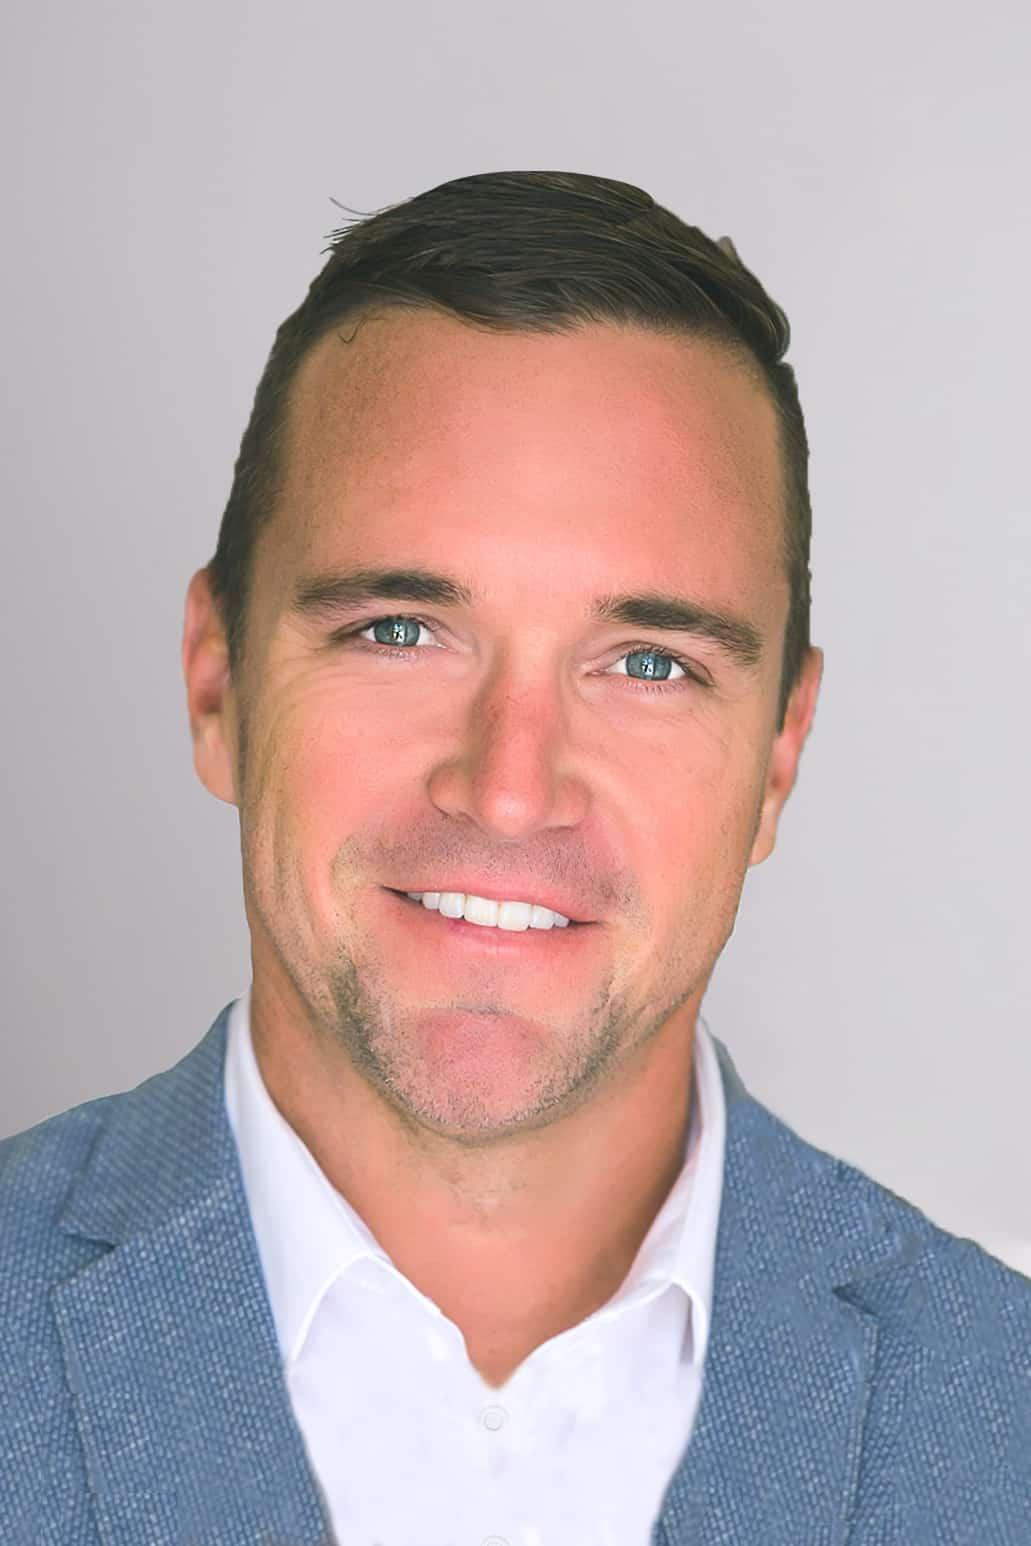 headshot of Conner Erwin